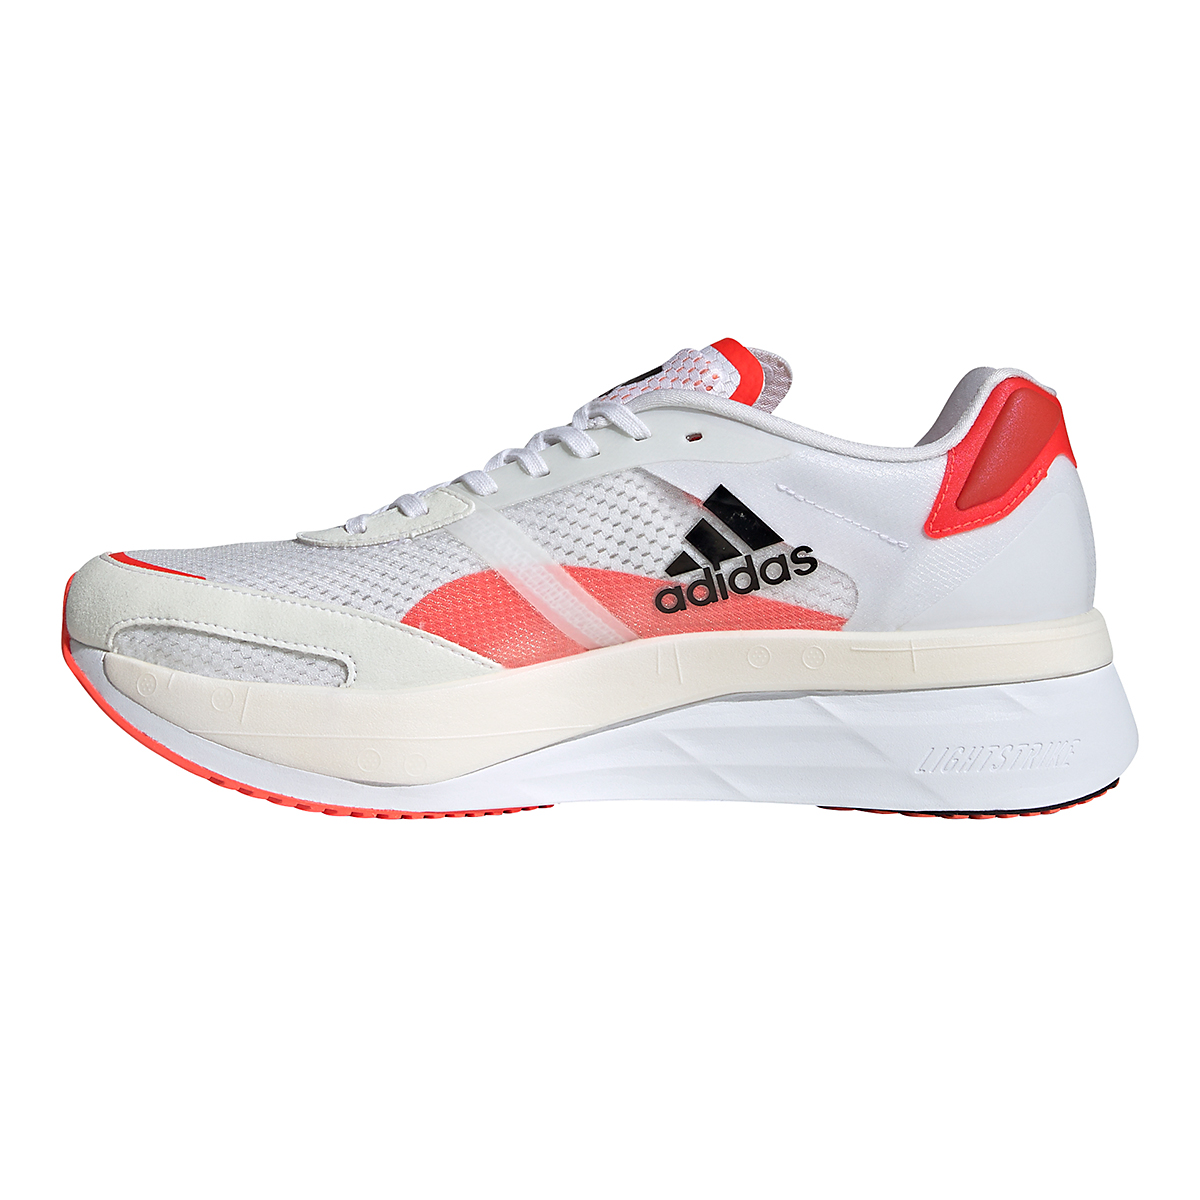 Men's Adidas Adizero Boston 10 Running Shoe - Color: Black/White/Solar Red - Size: 7 - Width: Regular, Black/White/Solar Red, large, image 2